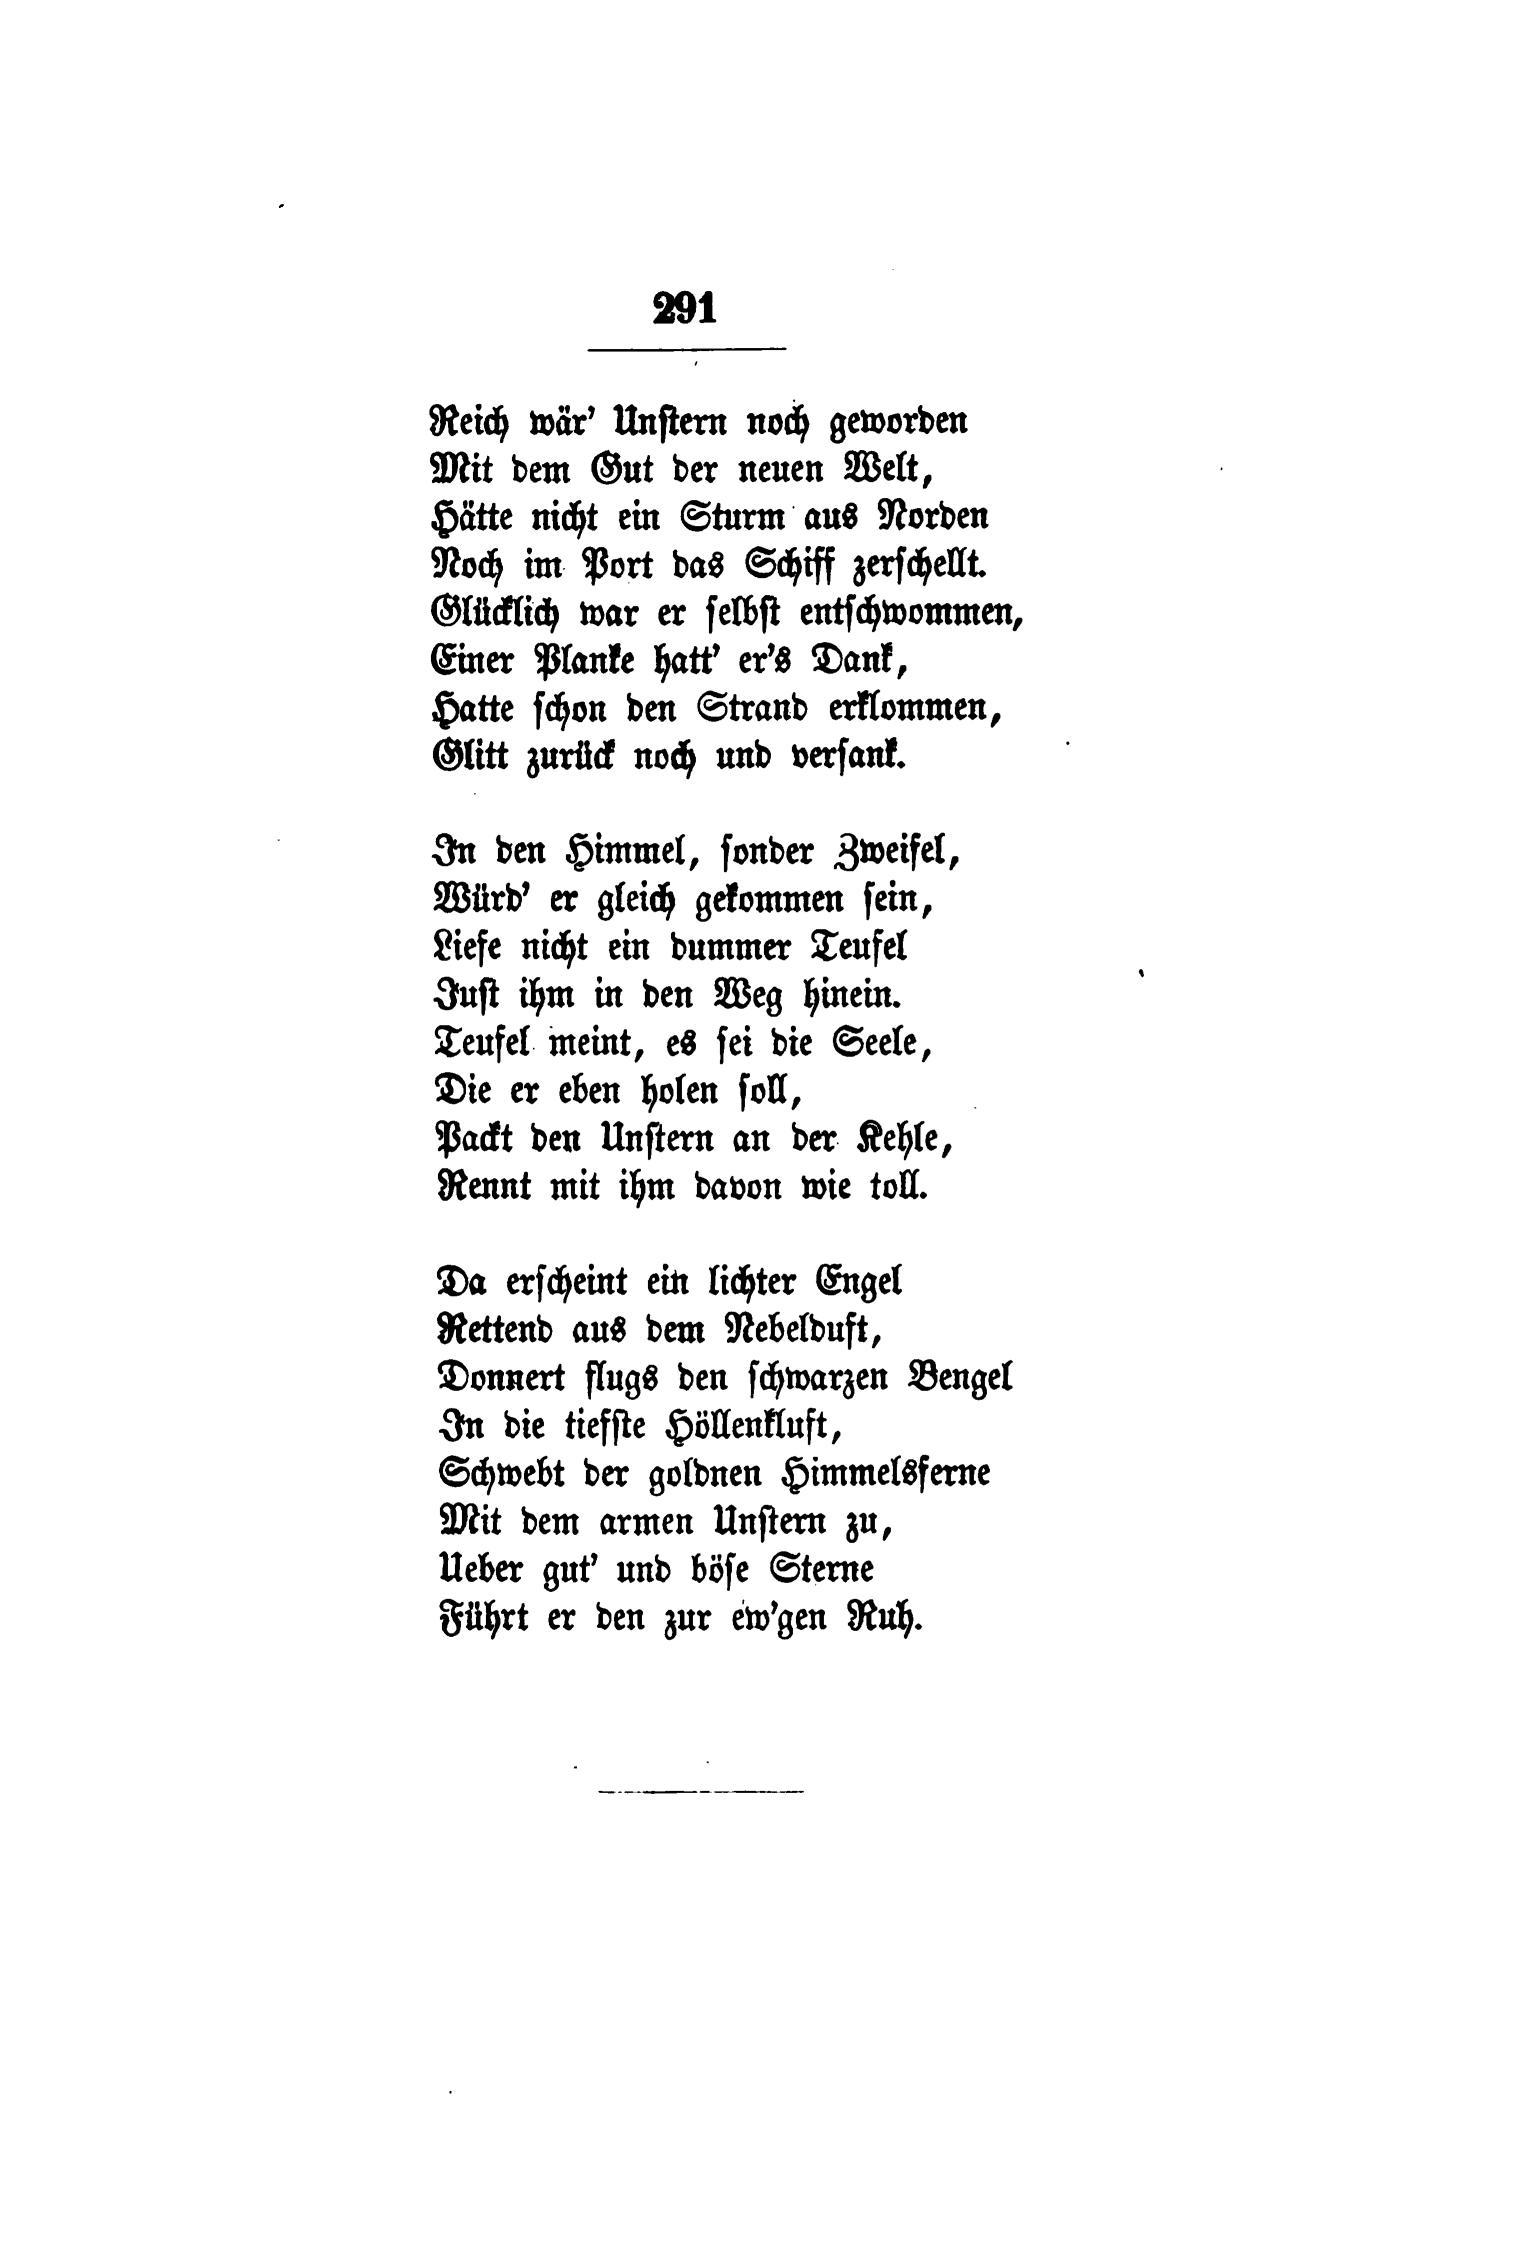 Filede Gedichte Uhland 309jpg Wikimedia Commons